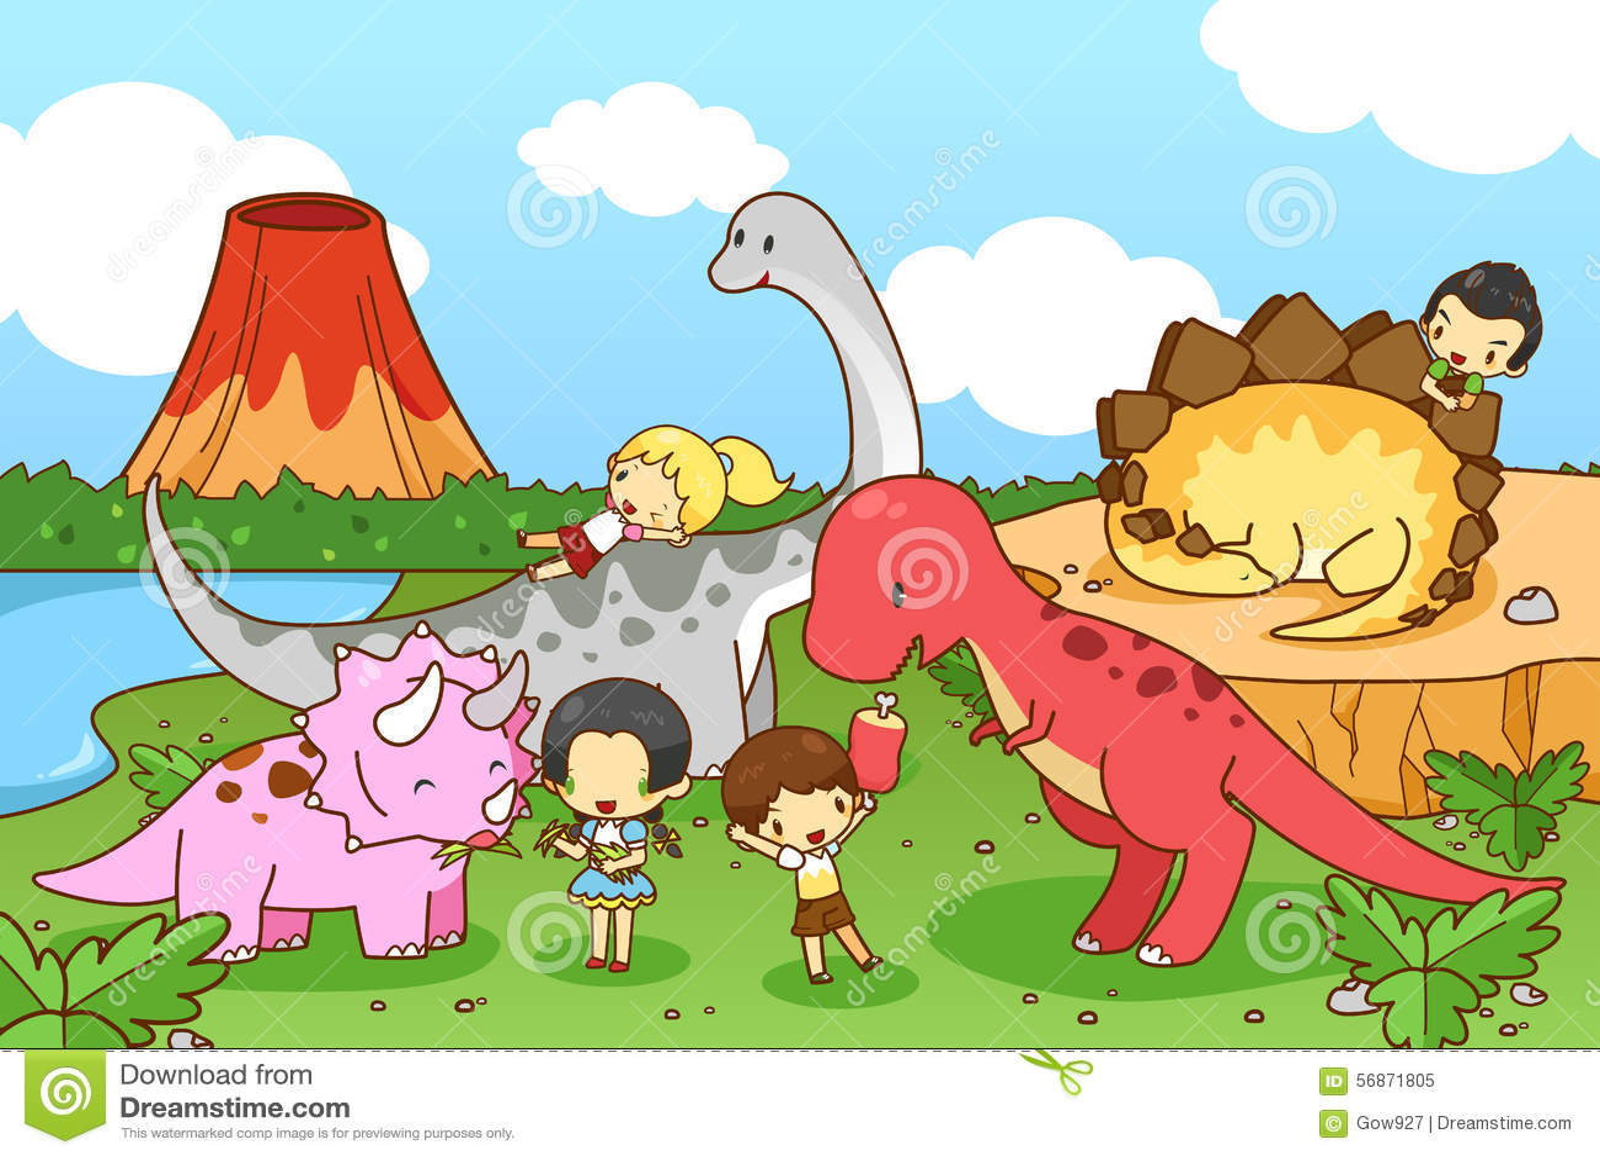 cartoon dinosaur world of imagination with kids and children pla